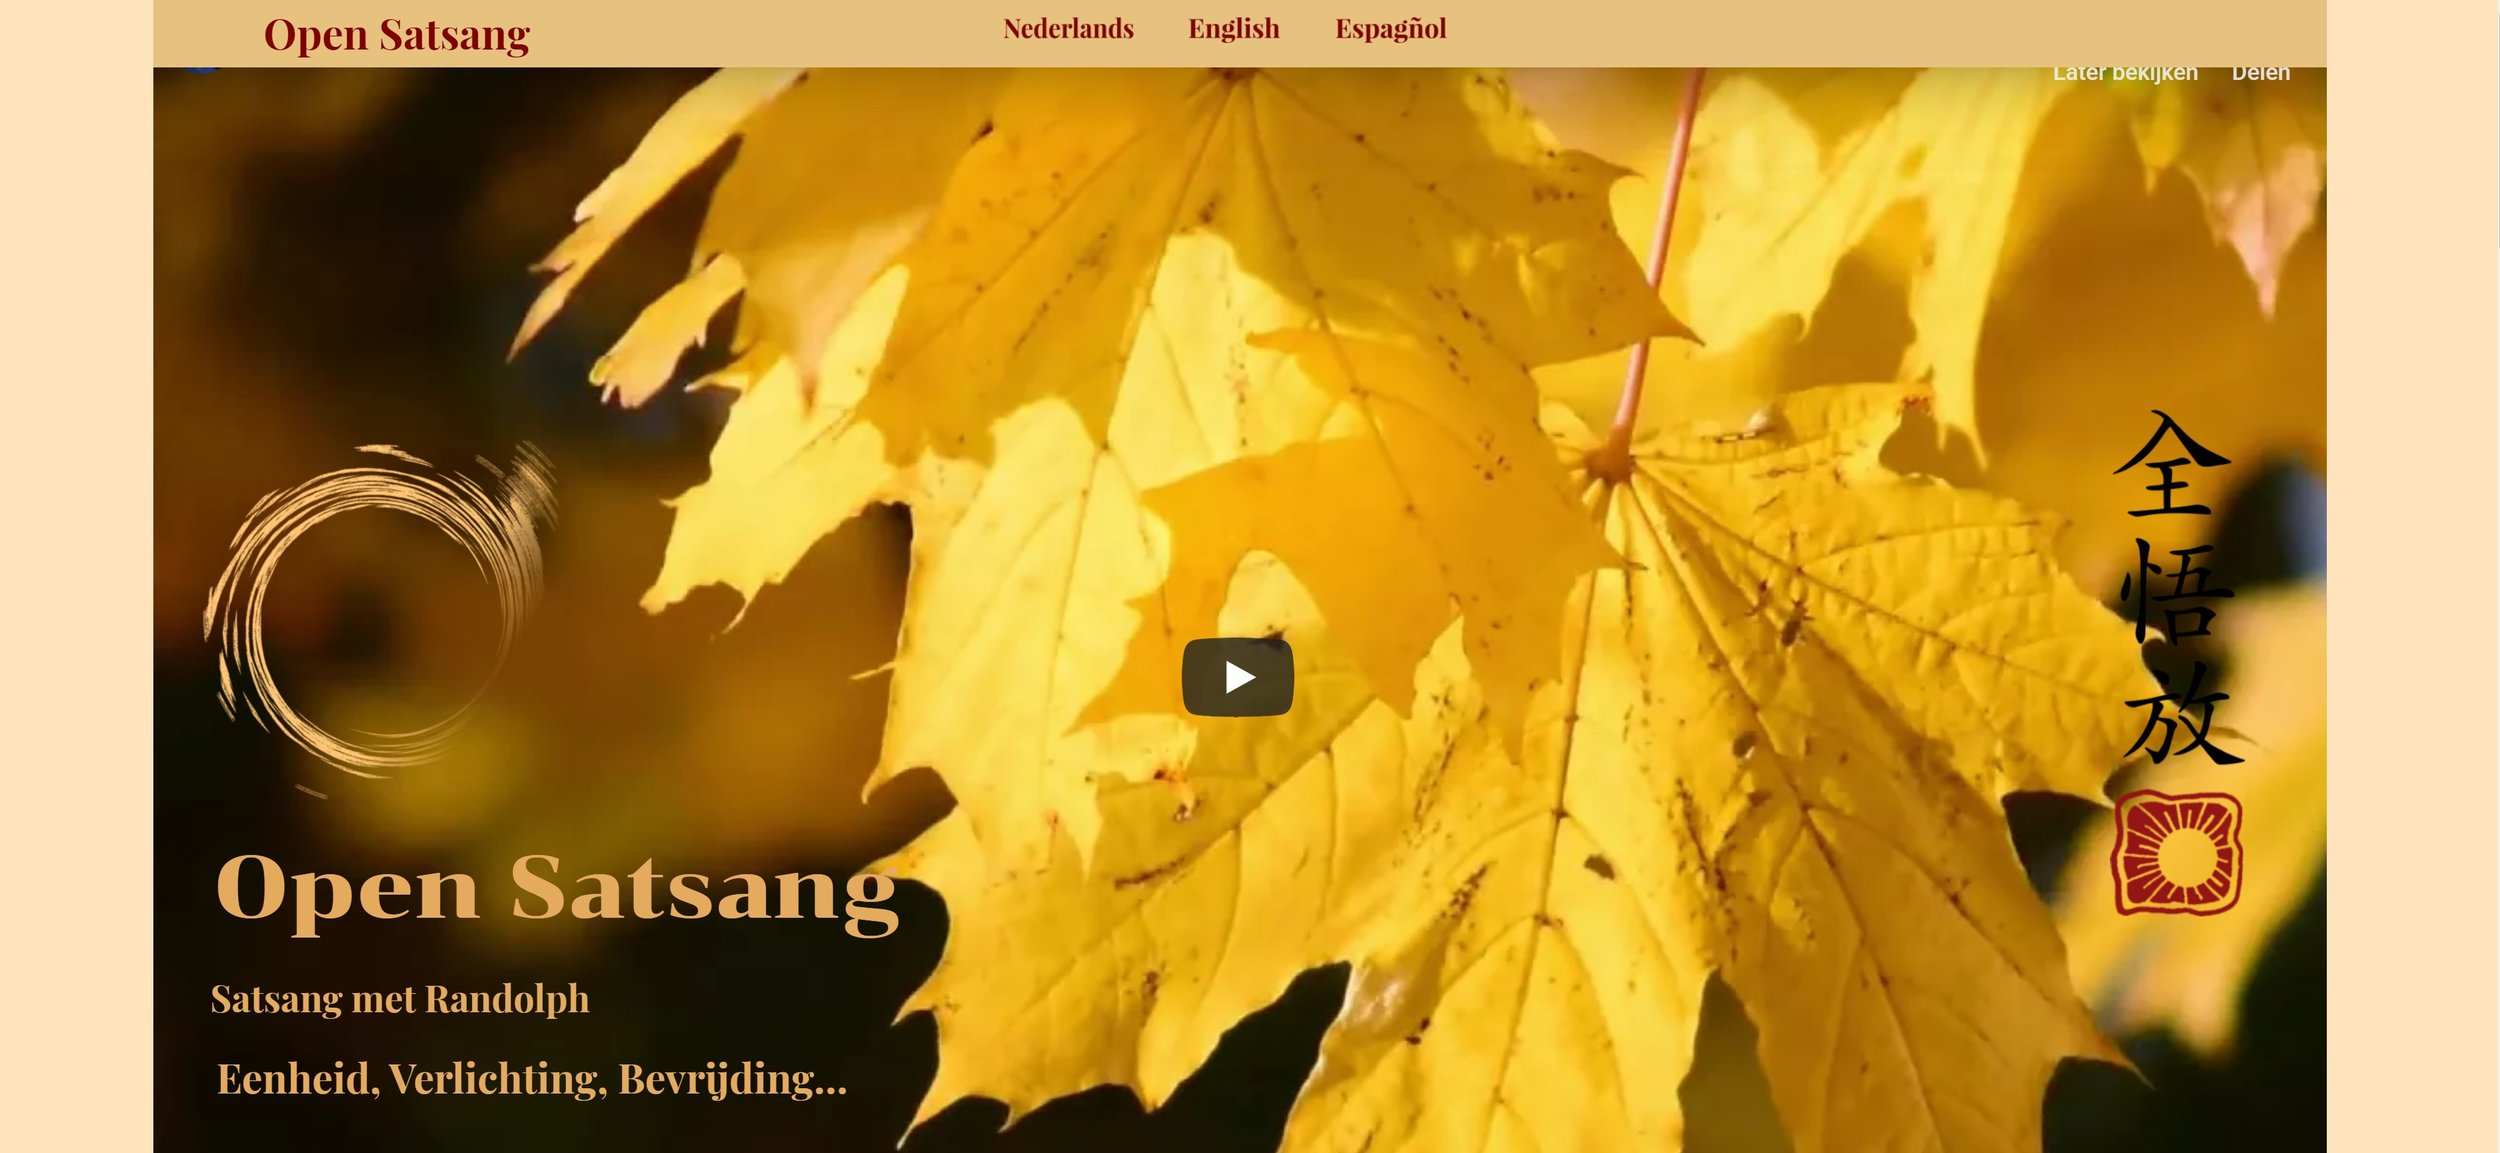 Open Satsang.nl